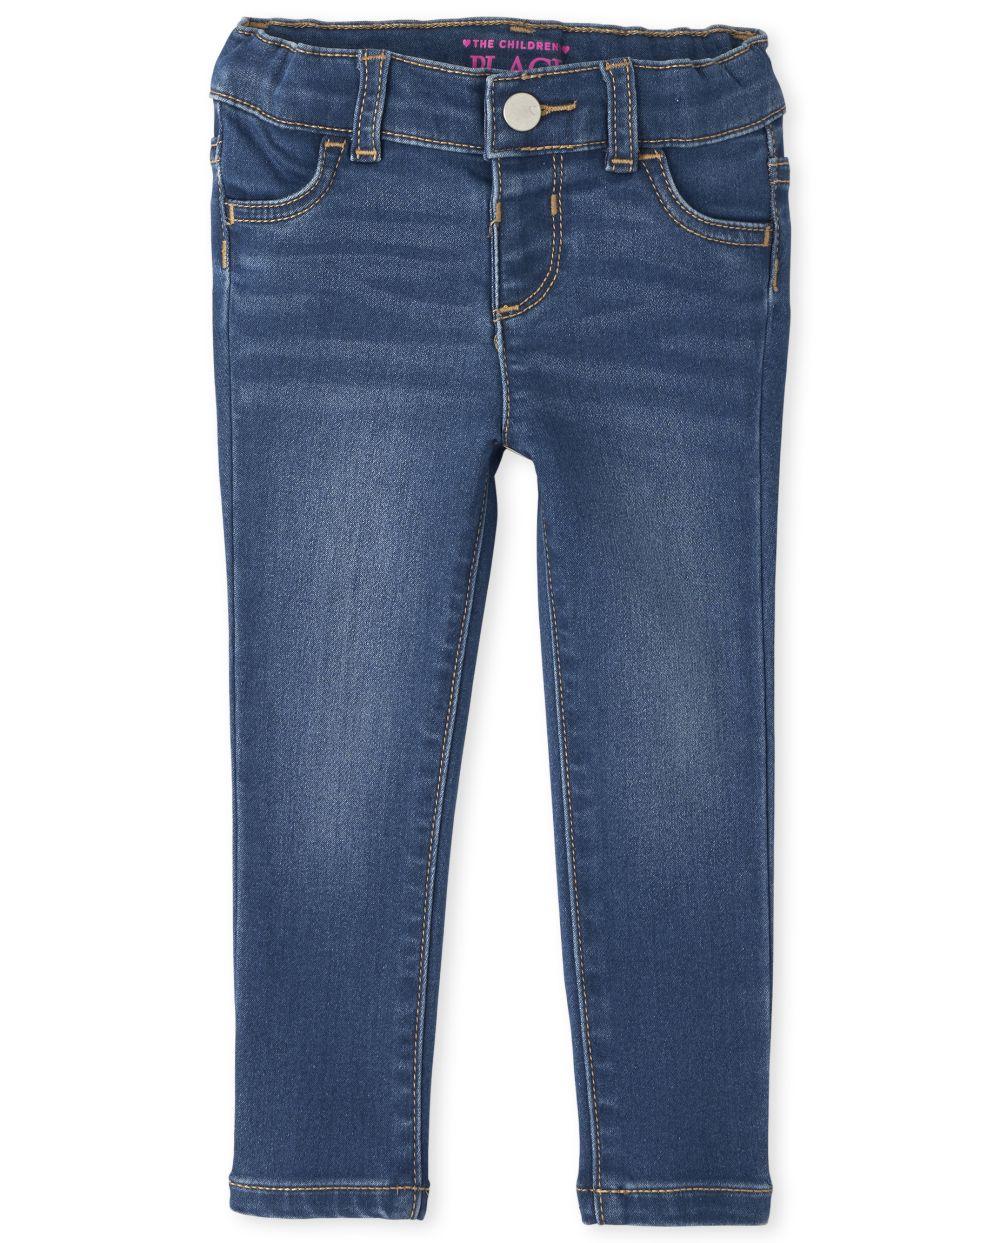 Baby And Toddler Girls Super-Soft Stretch Denim Legging Jeans